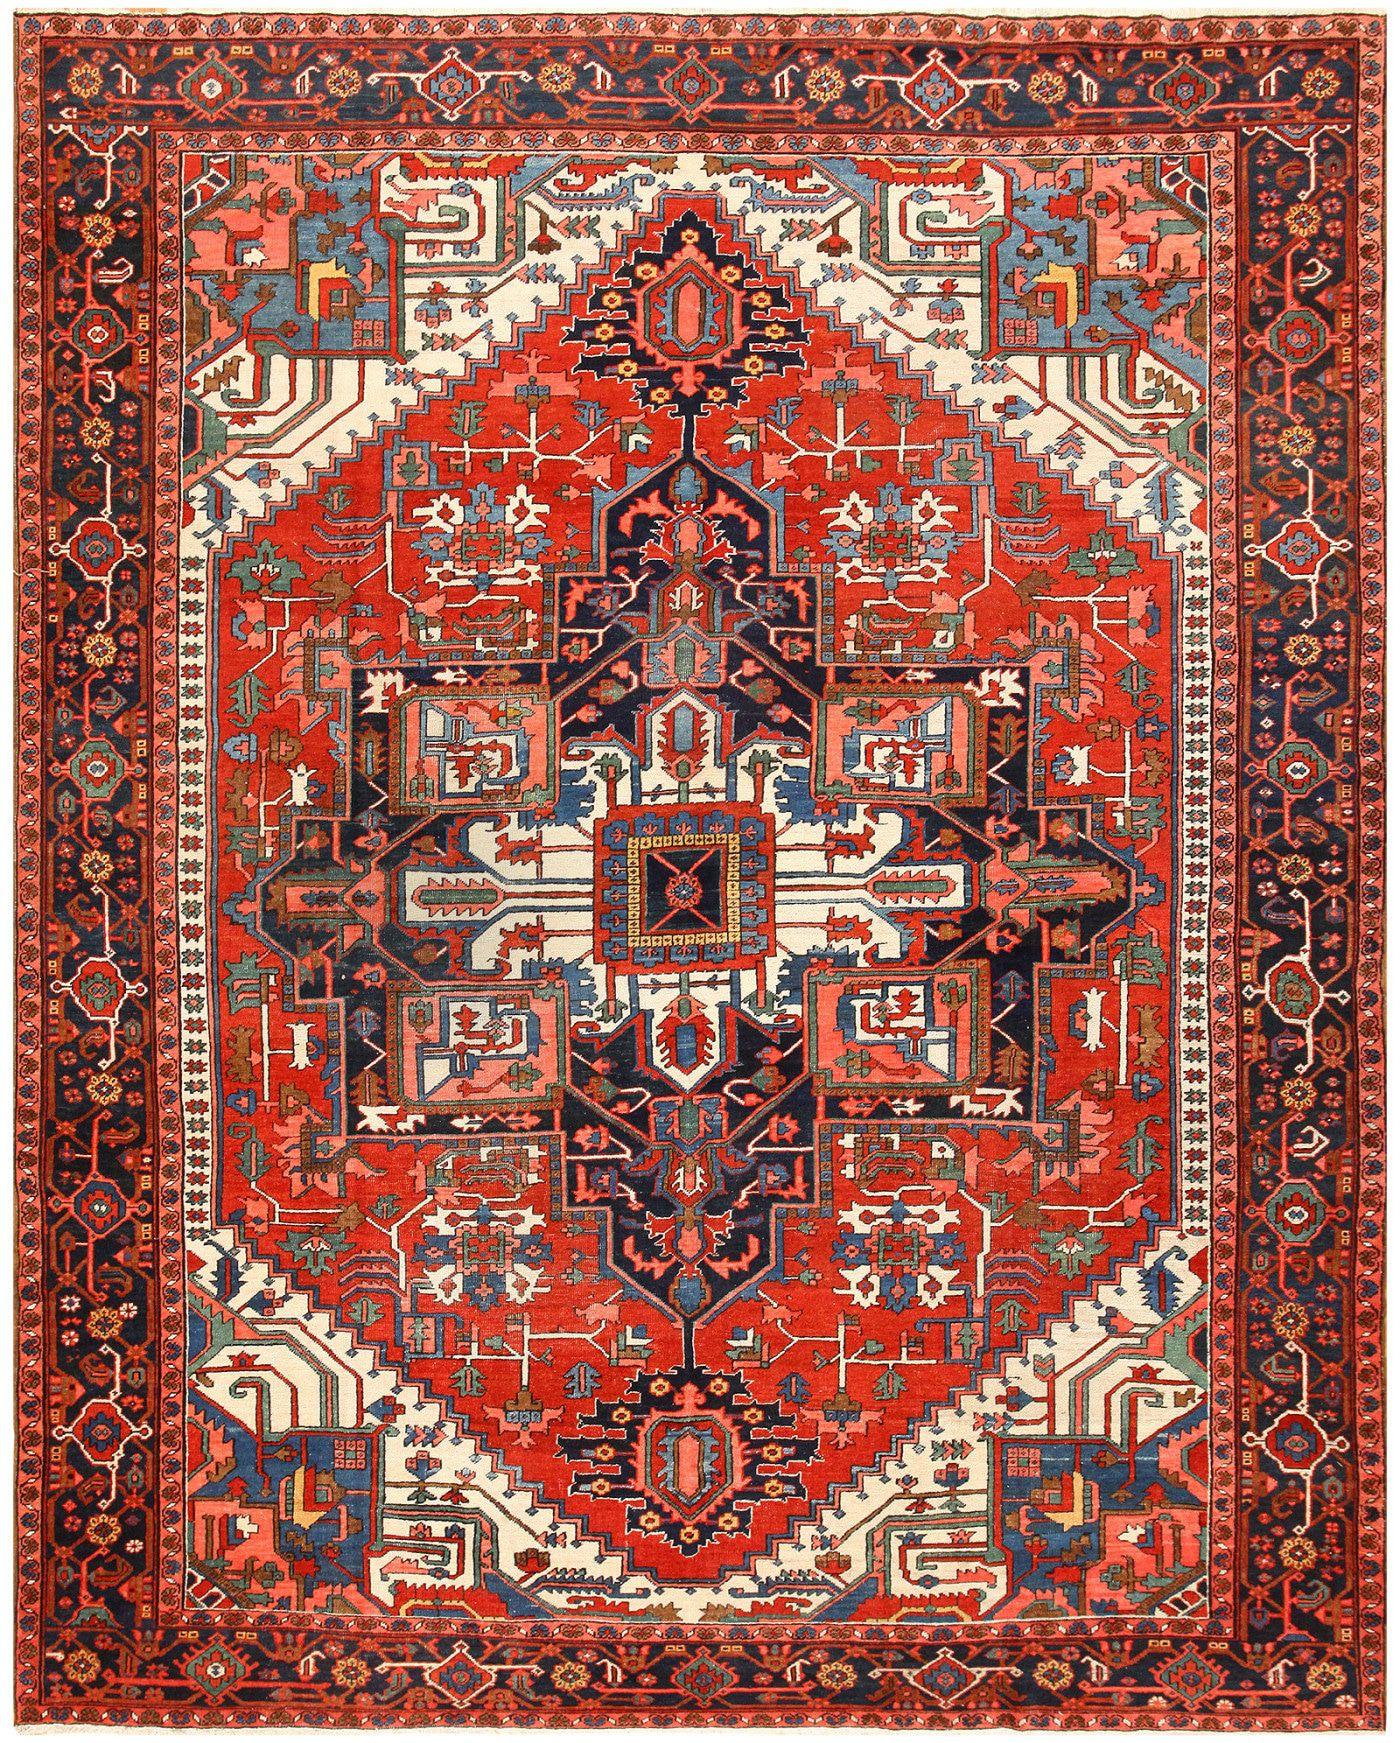 heriz rugs antique persian heriz rug 48468 detail/large view OPGUQTI